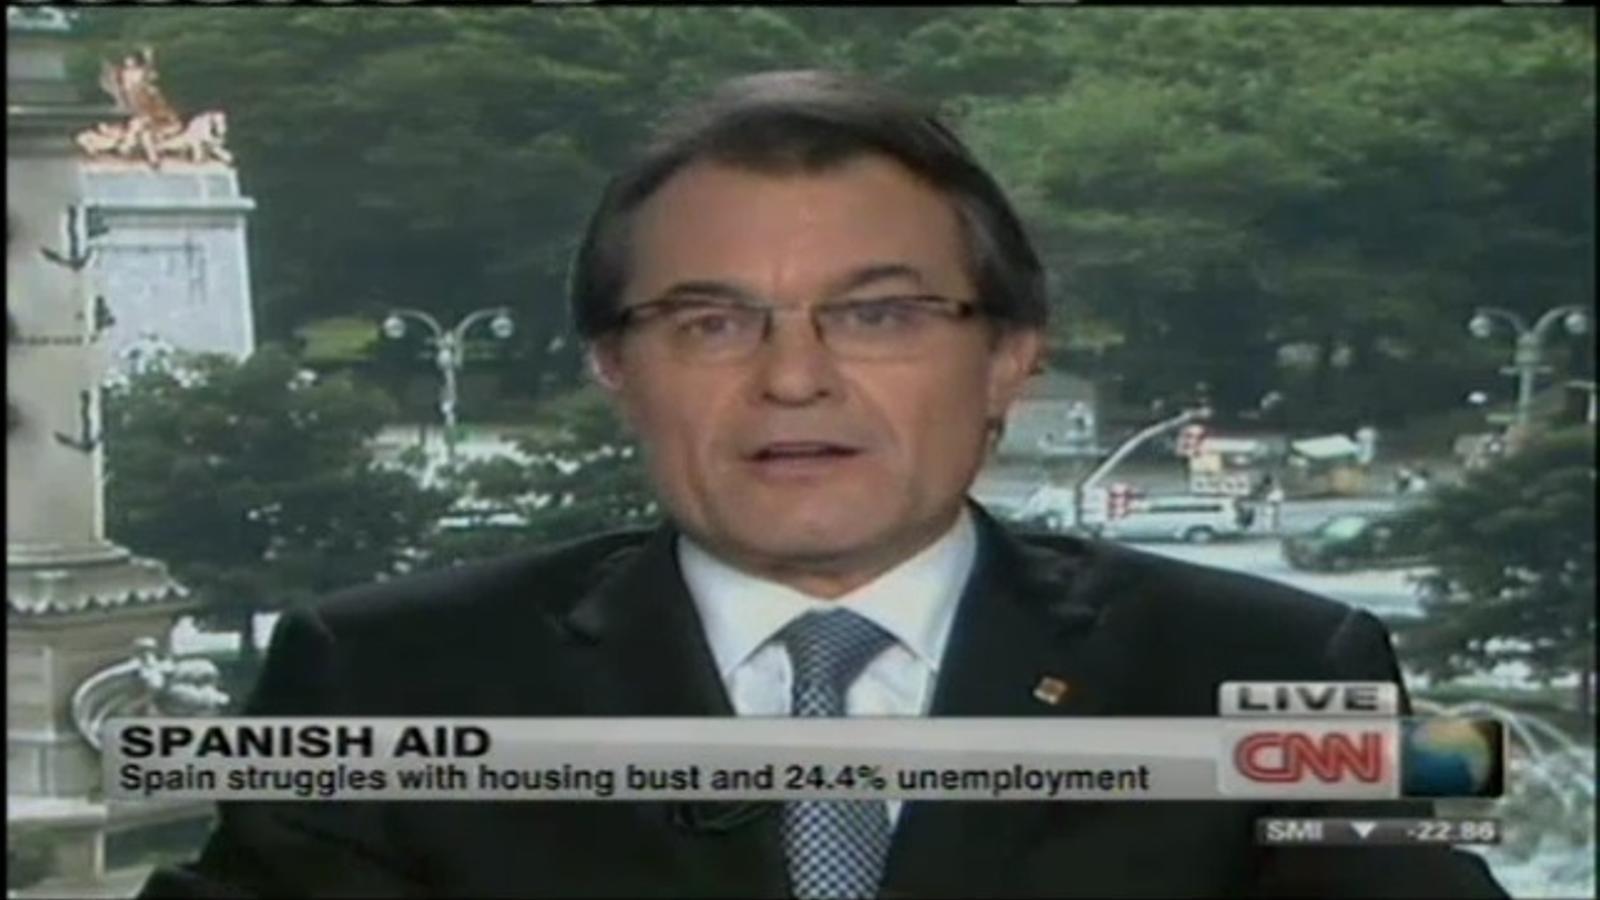 Entrevista al President Artur Mas a la cadena CNN